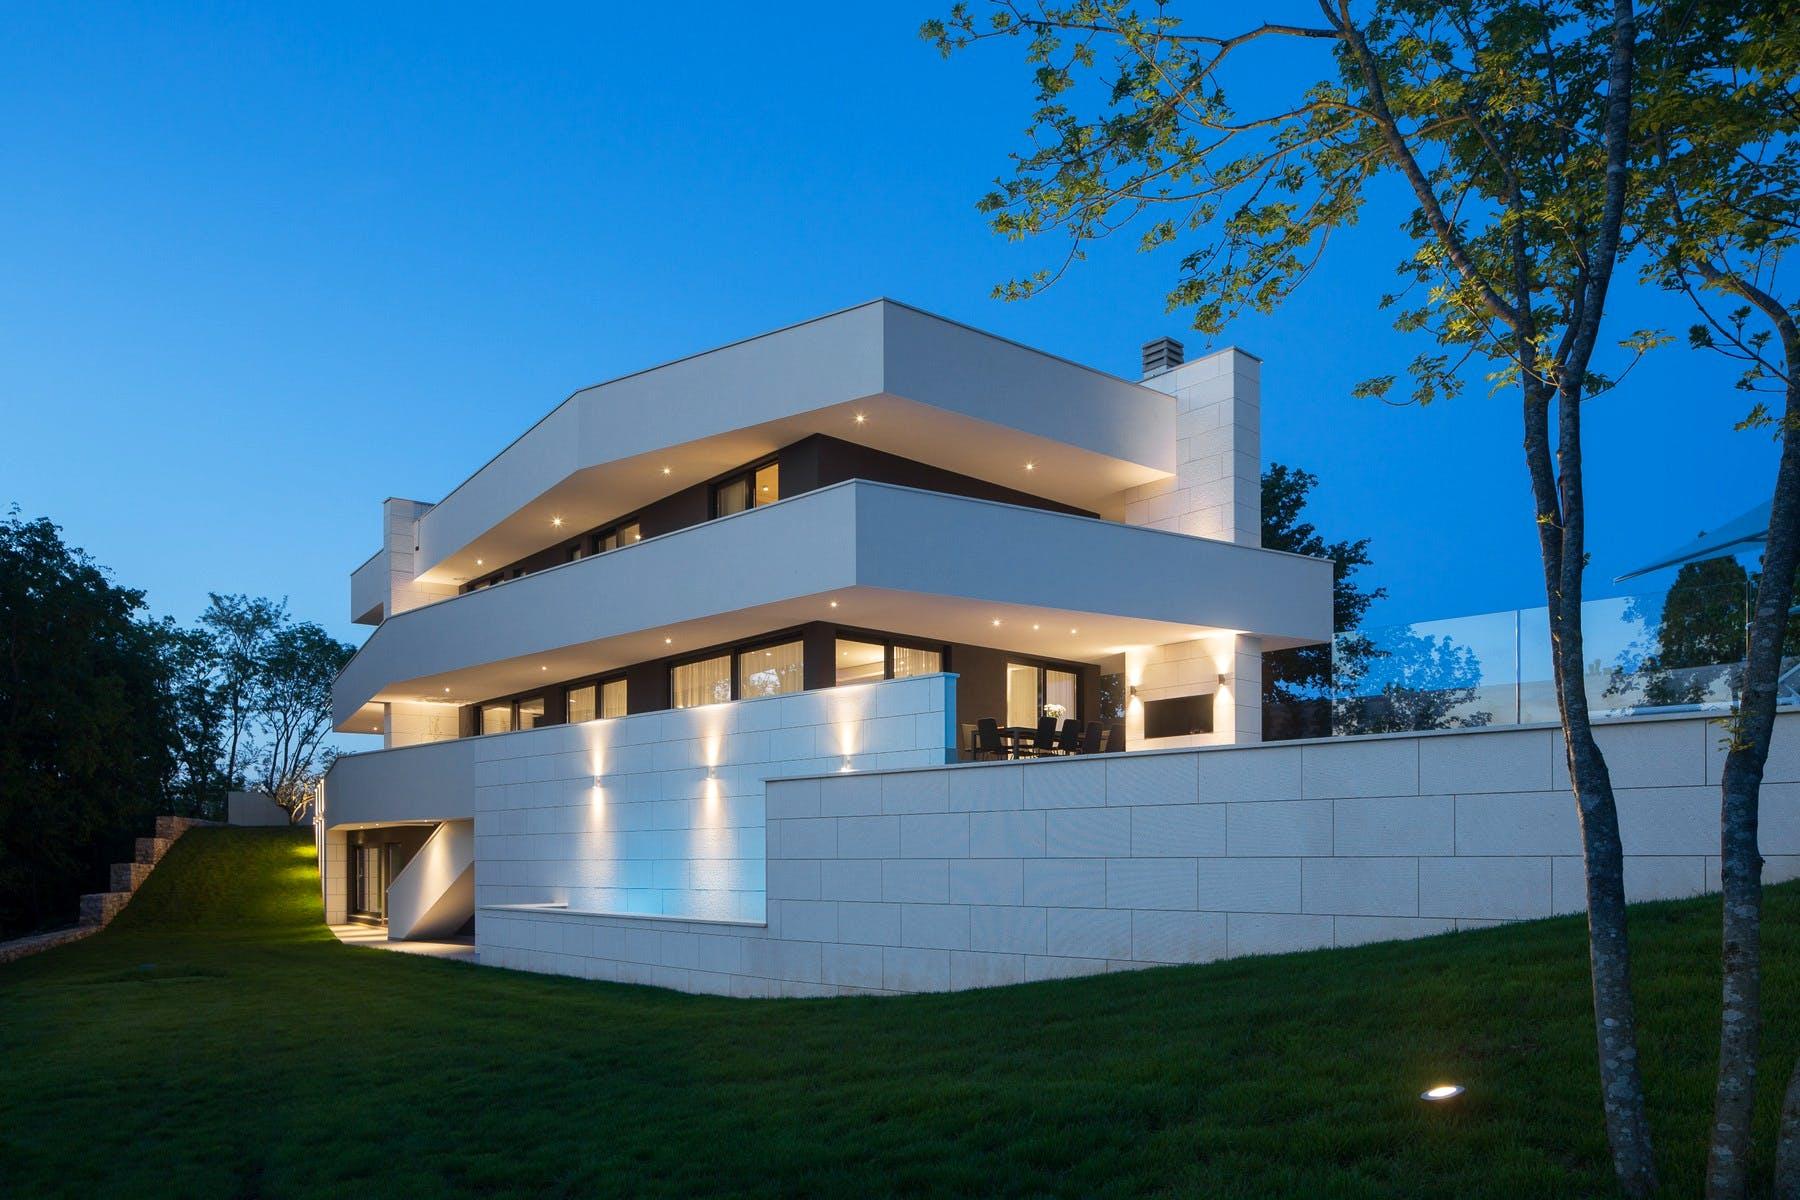 Appealing exterior design of the villa